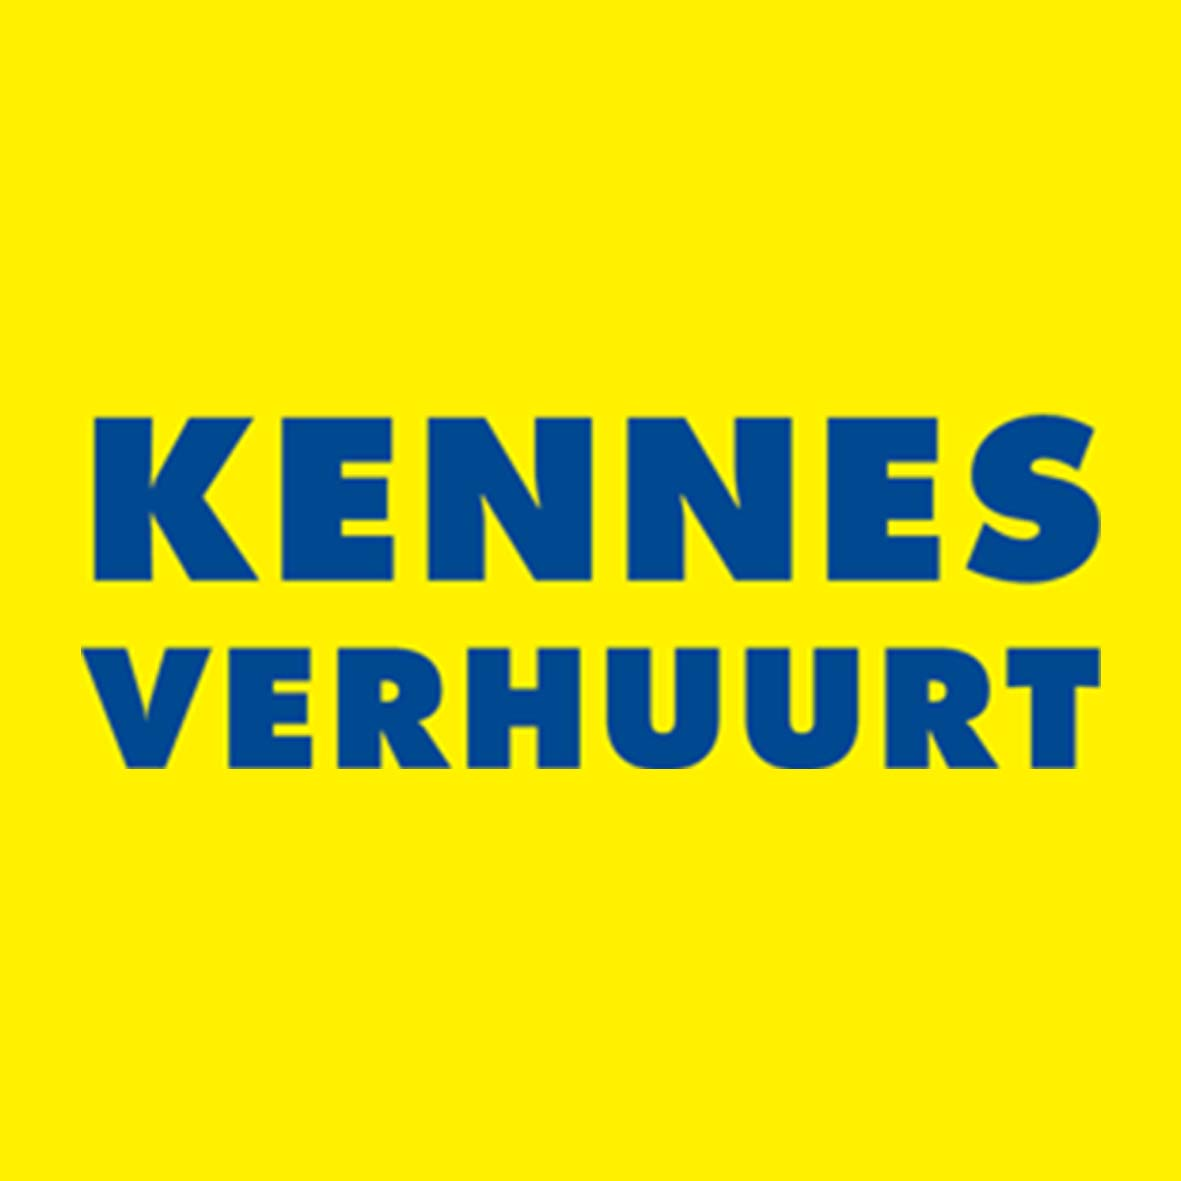 Kennes_Verhuurt